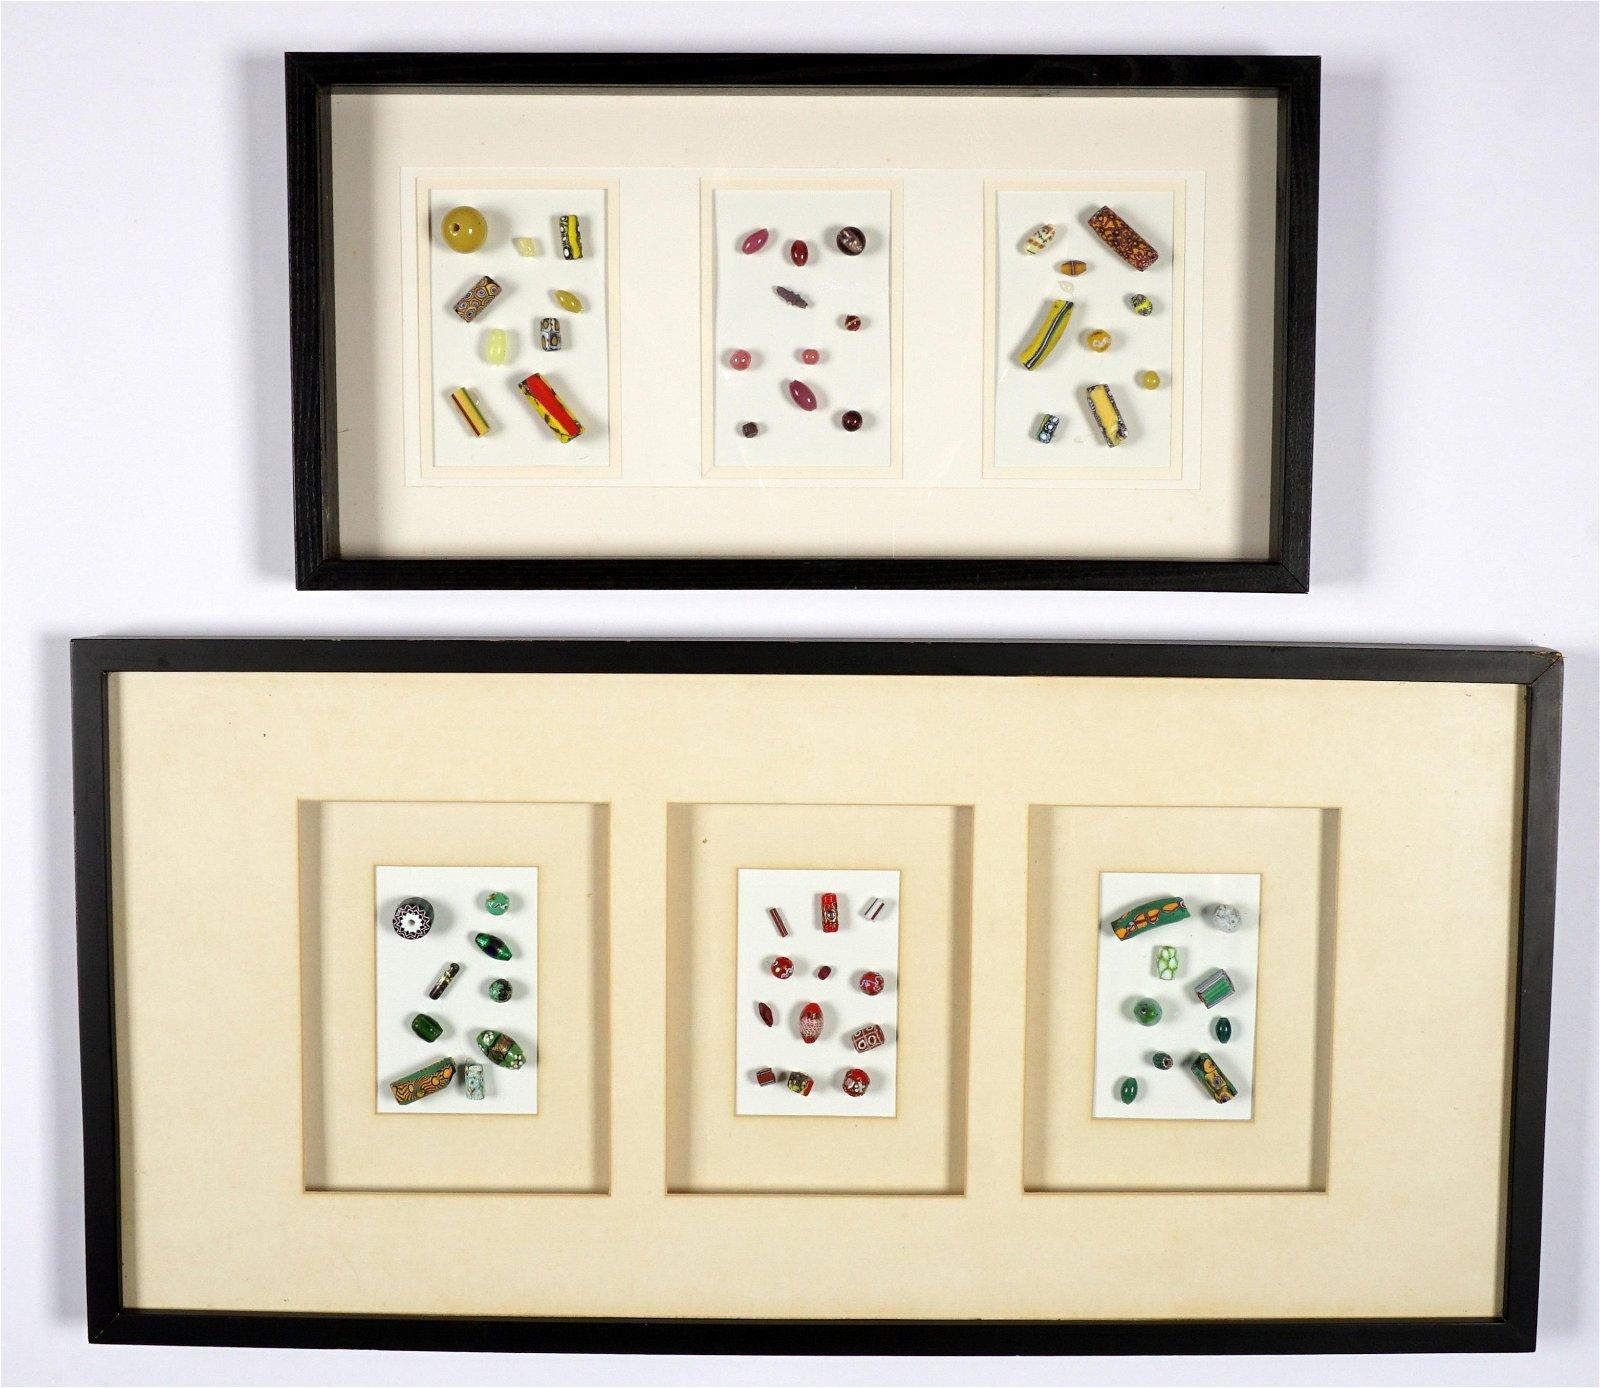 Two Framed Sets of Venetian Trade Beads